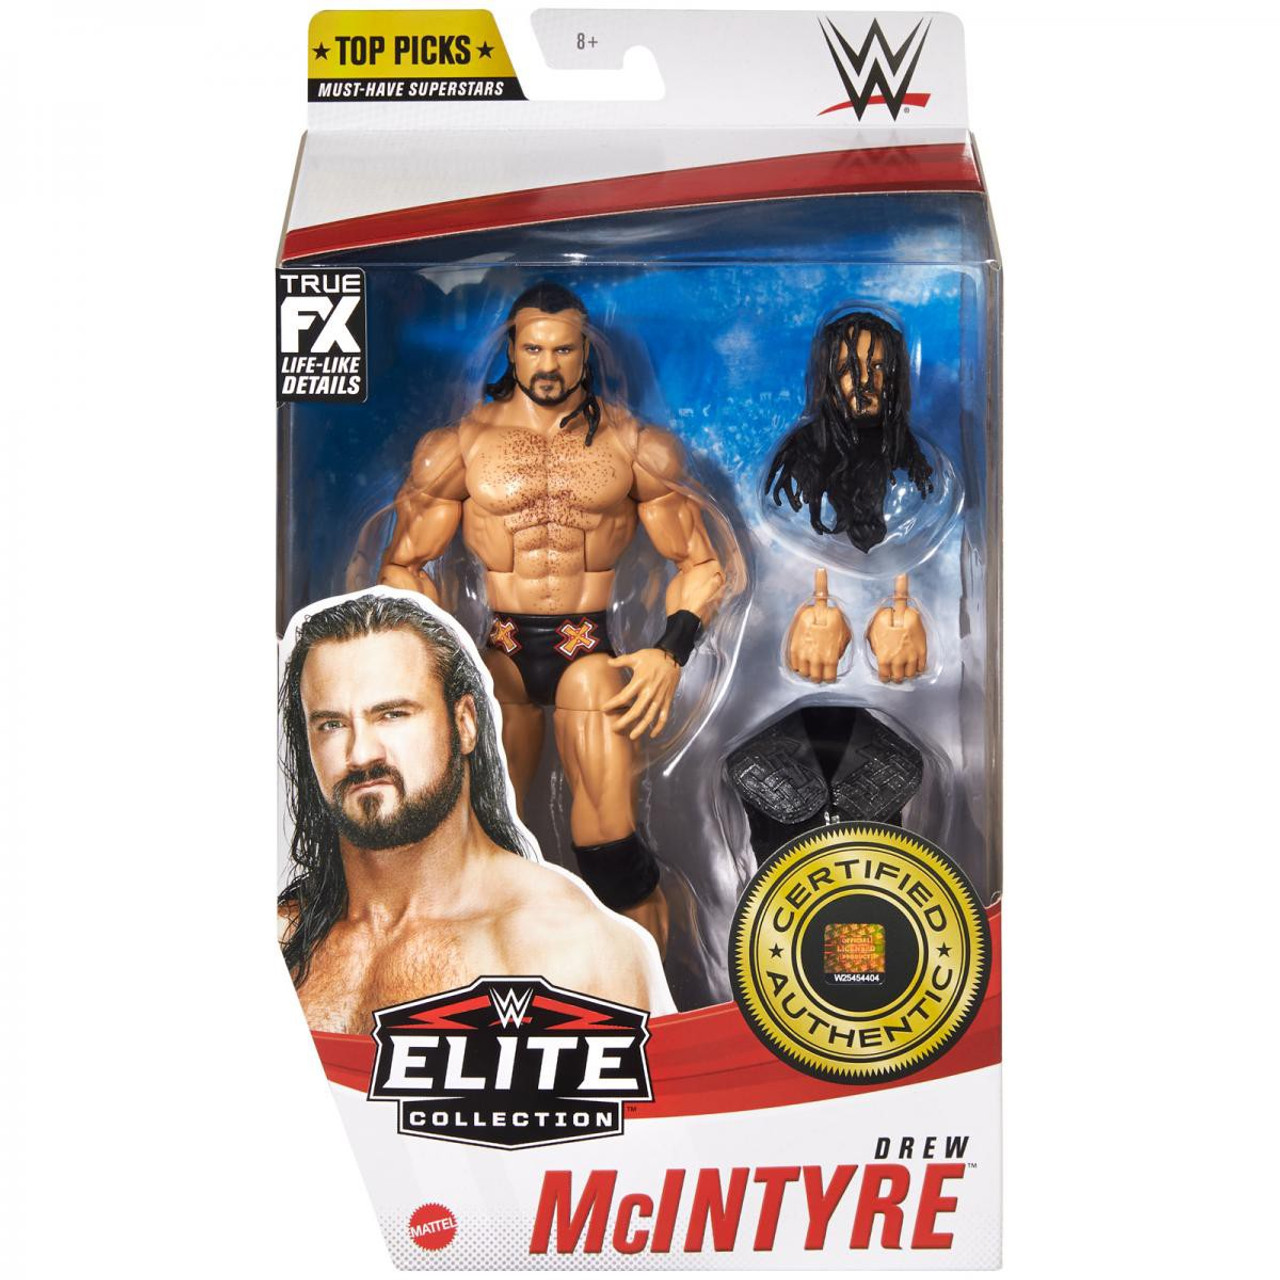 Wwe Wrestling Elite Top Picks 2021 Drew Mcintyre 6 Action Figure Mattel Toys Toywiz